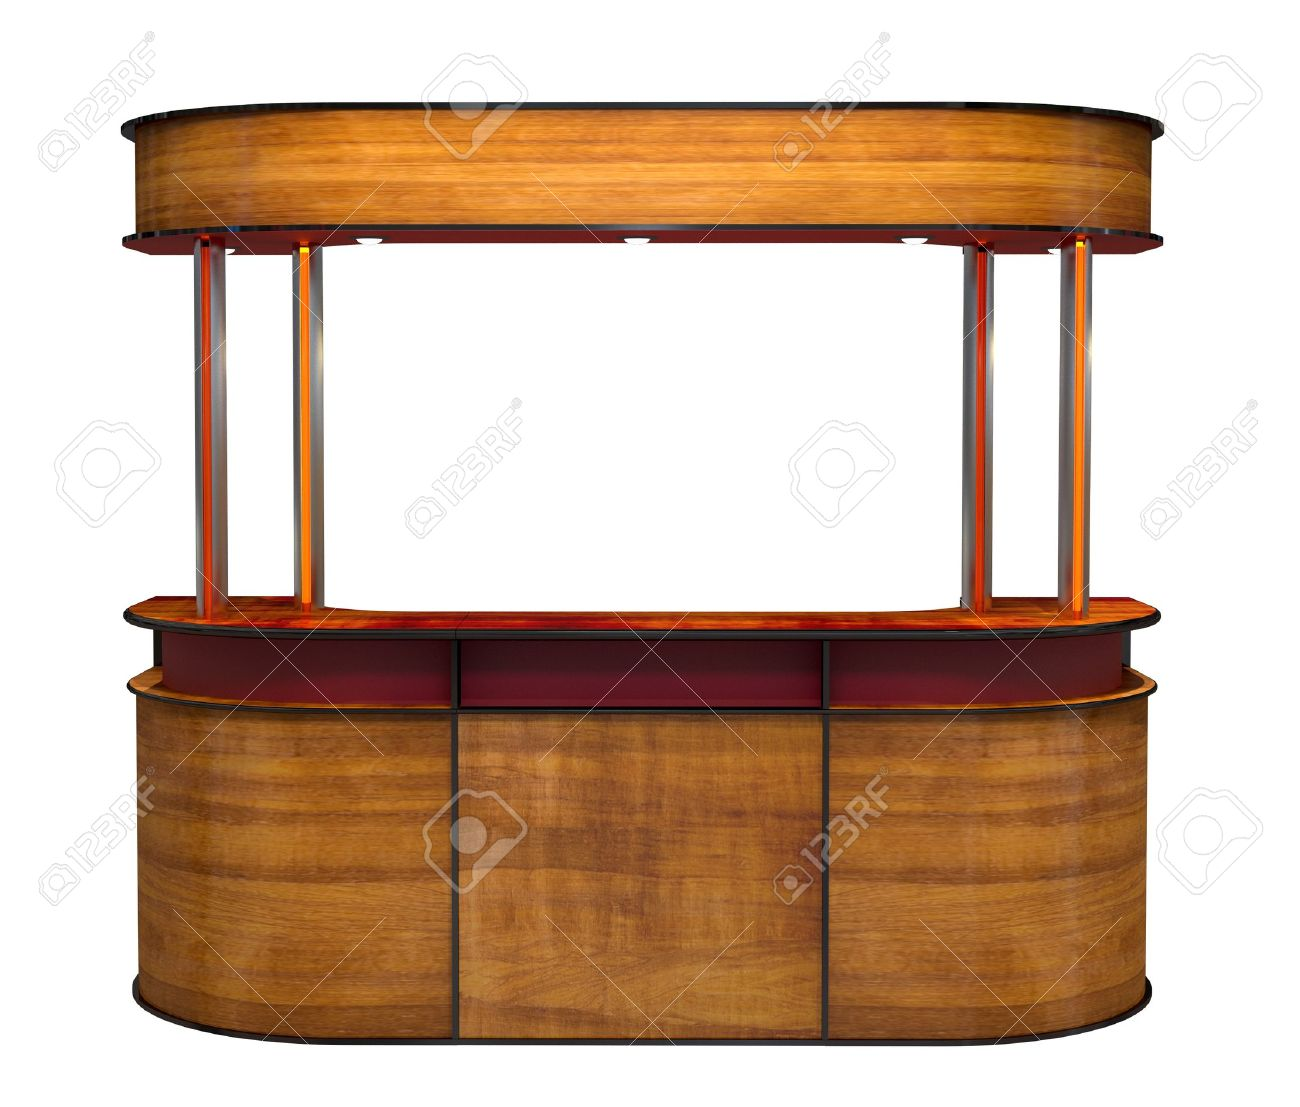 wooden bar counter Stock Photo - 12620220